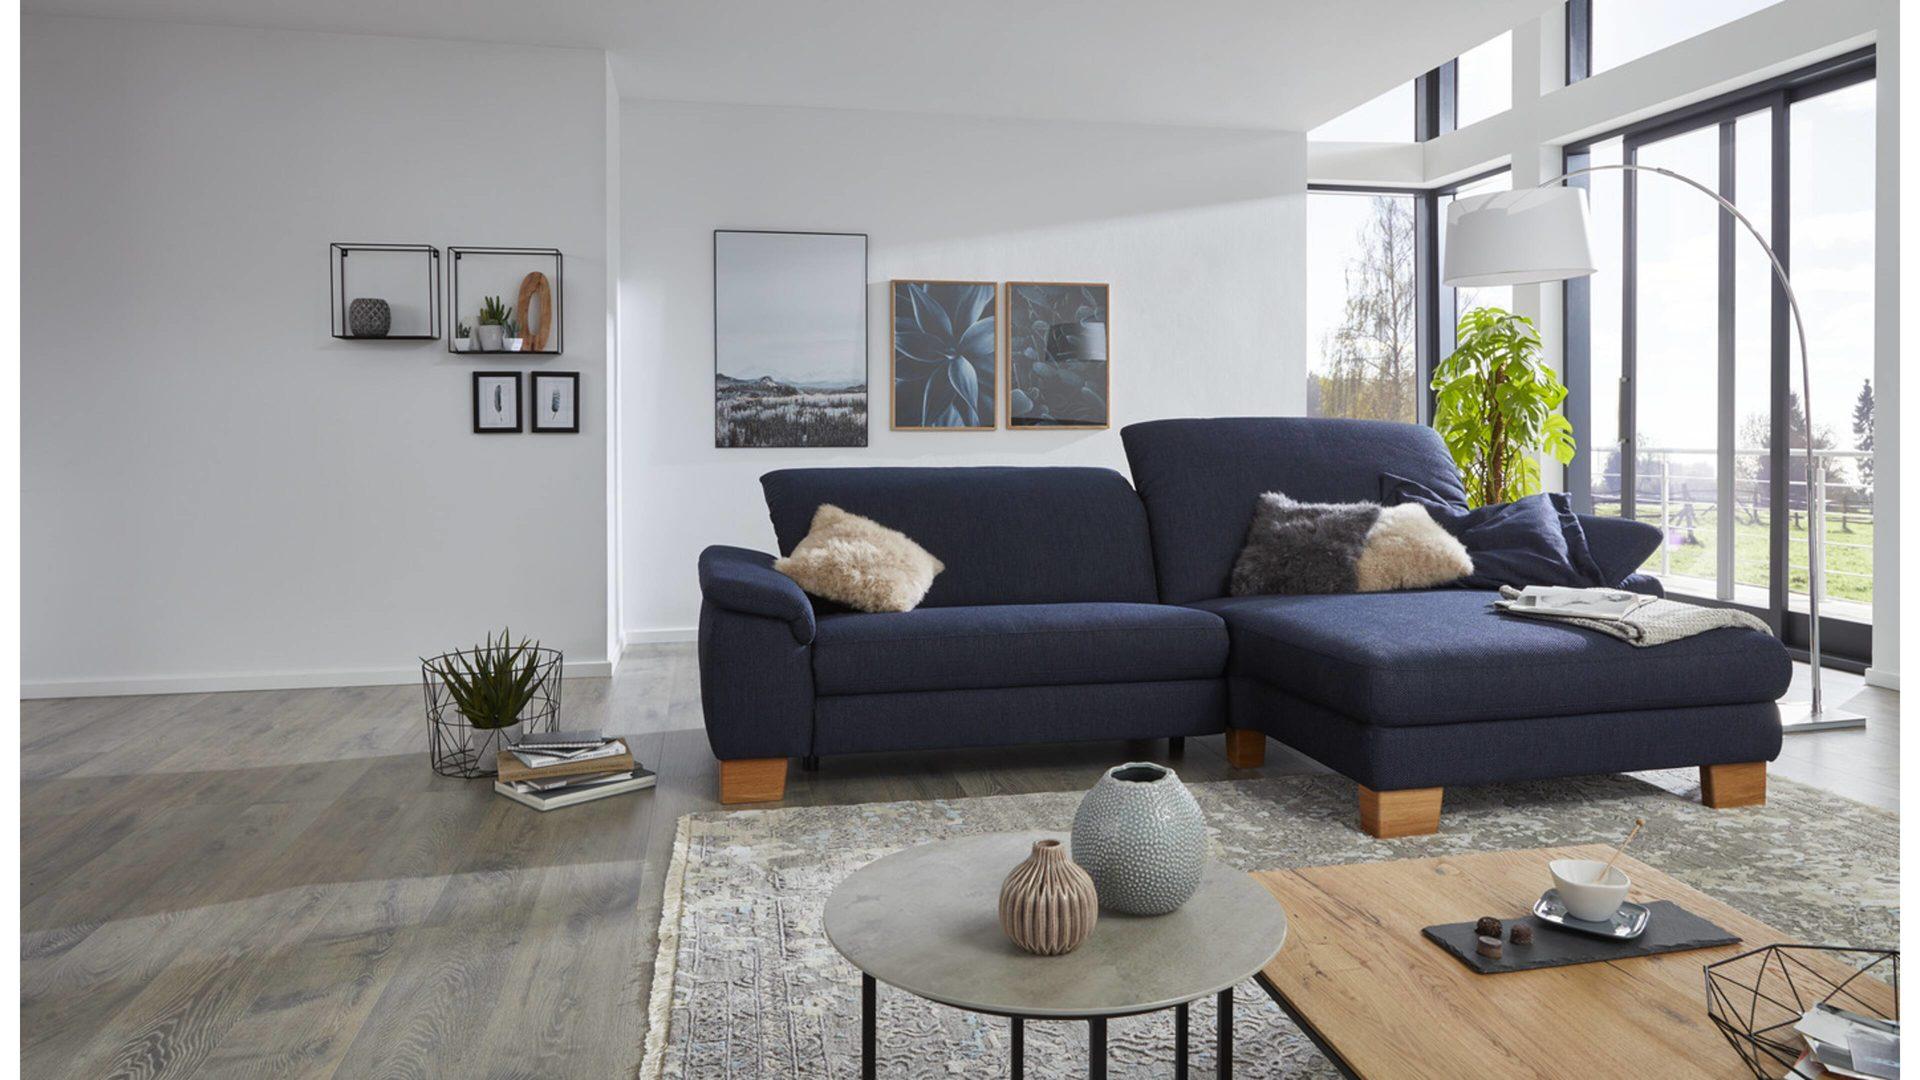 Interliving Sofa Serie 4101 Eckkombination Navyfarbener Bezug